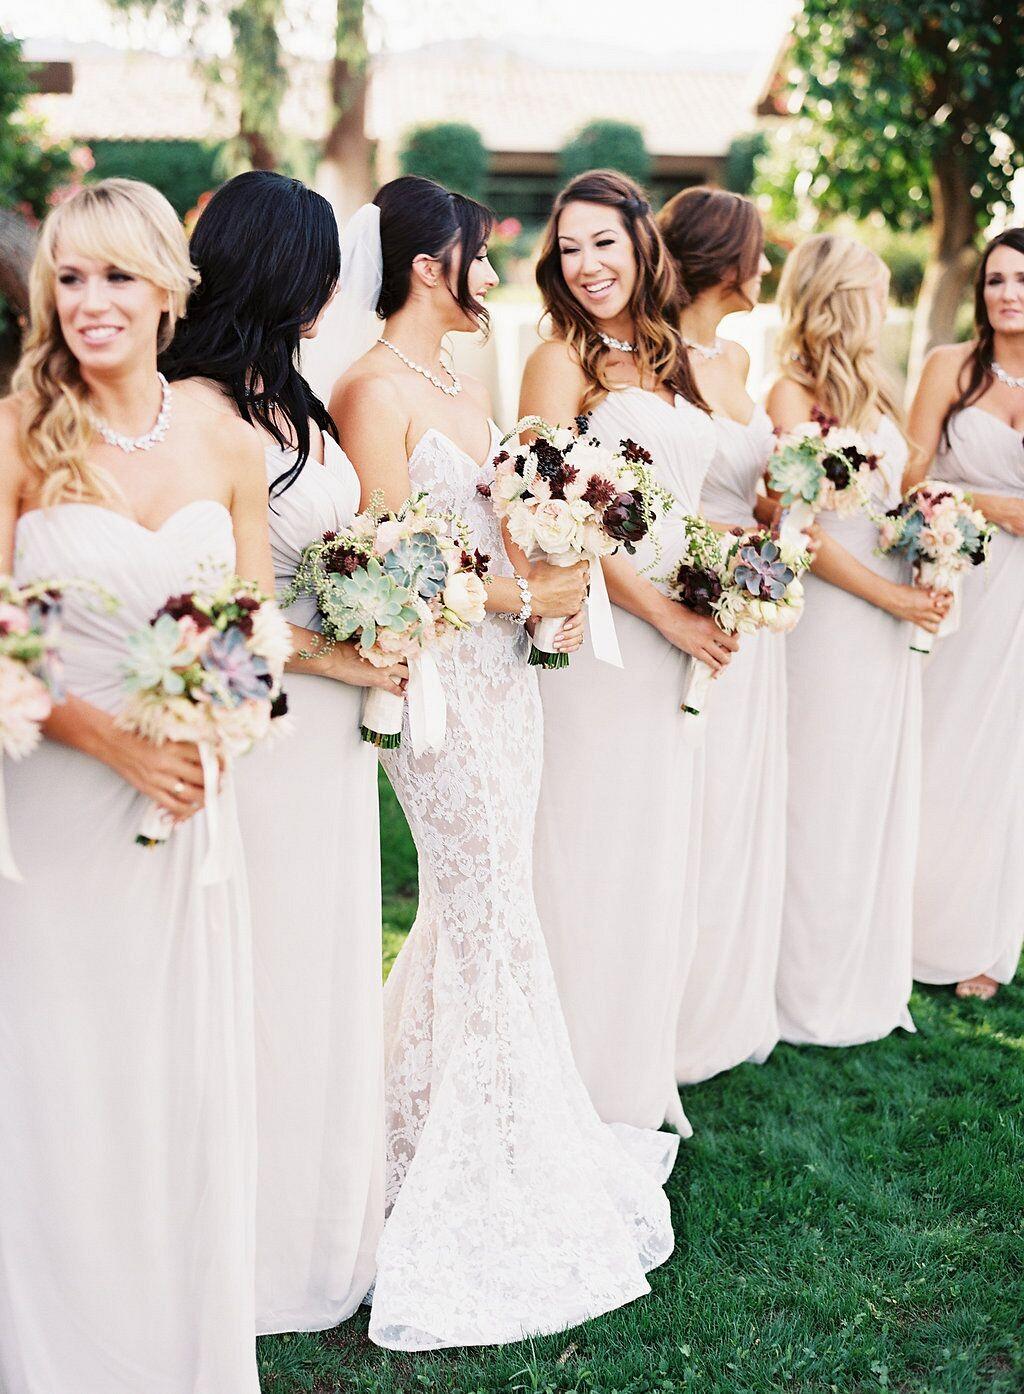 Katy and Brock's Organic California Wedding